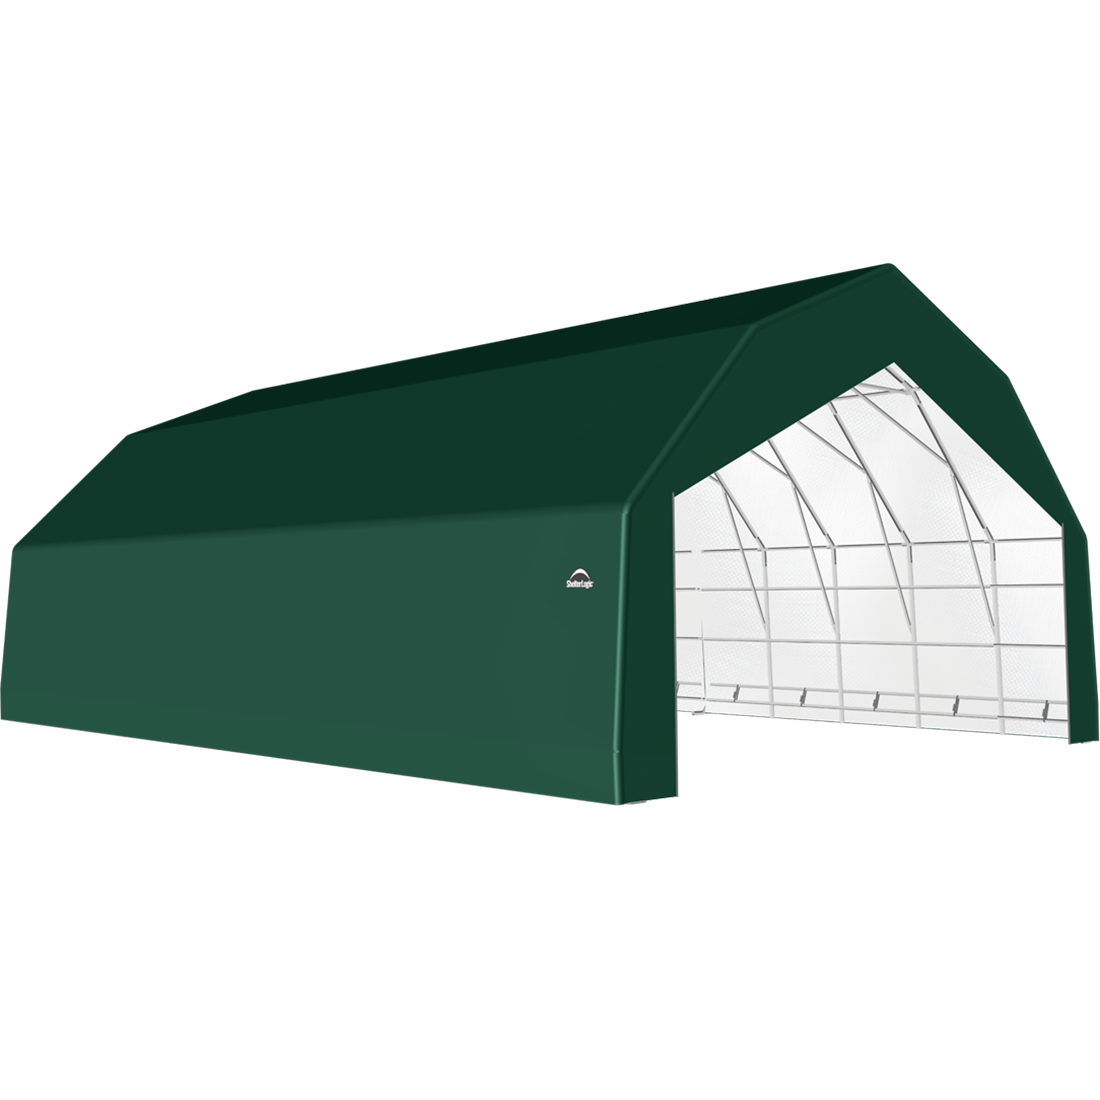 ShelterTech SP Series Barn Shelter, 30 ft. x 40 ft. x 18 ft. Heavy Duty PVC 14.5 oz. Green